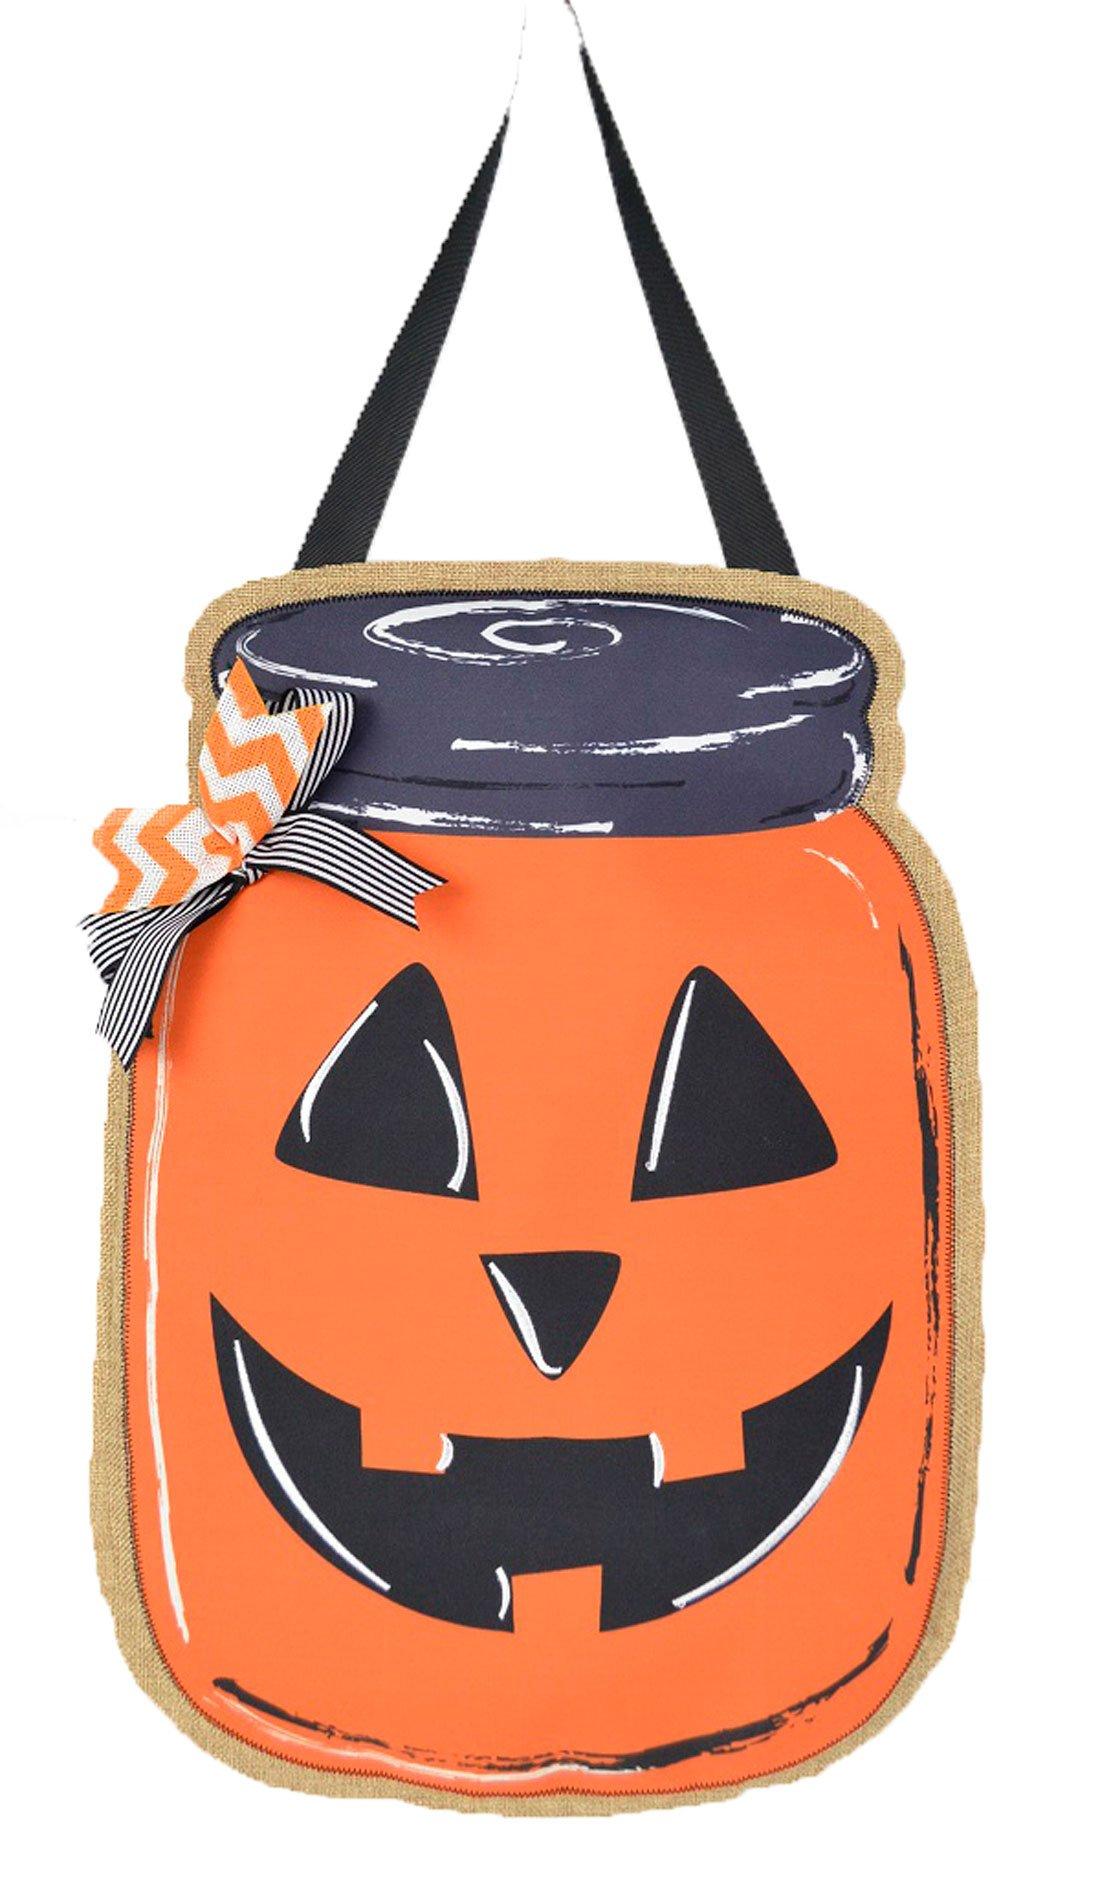 JEC Home Goods Jack O Lantern Decoration Door Hanger - Halloween Mason Jar - Front Door Decoration or Wall Decor on Burlap - Large 18 Inch Size